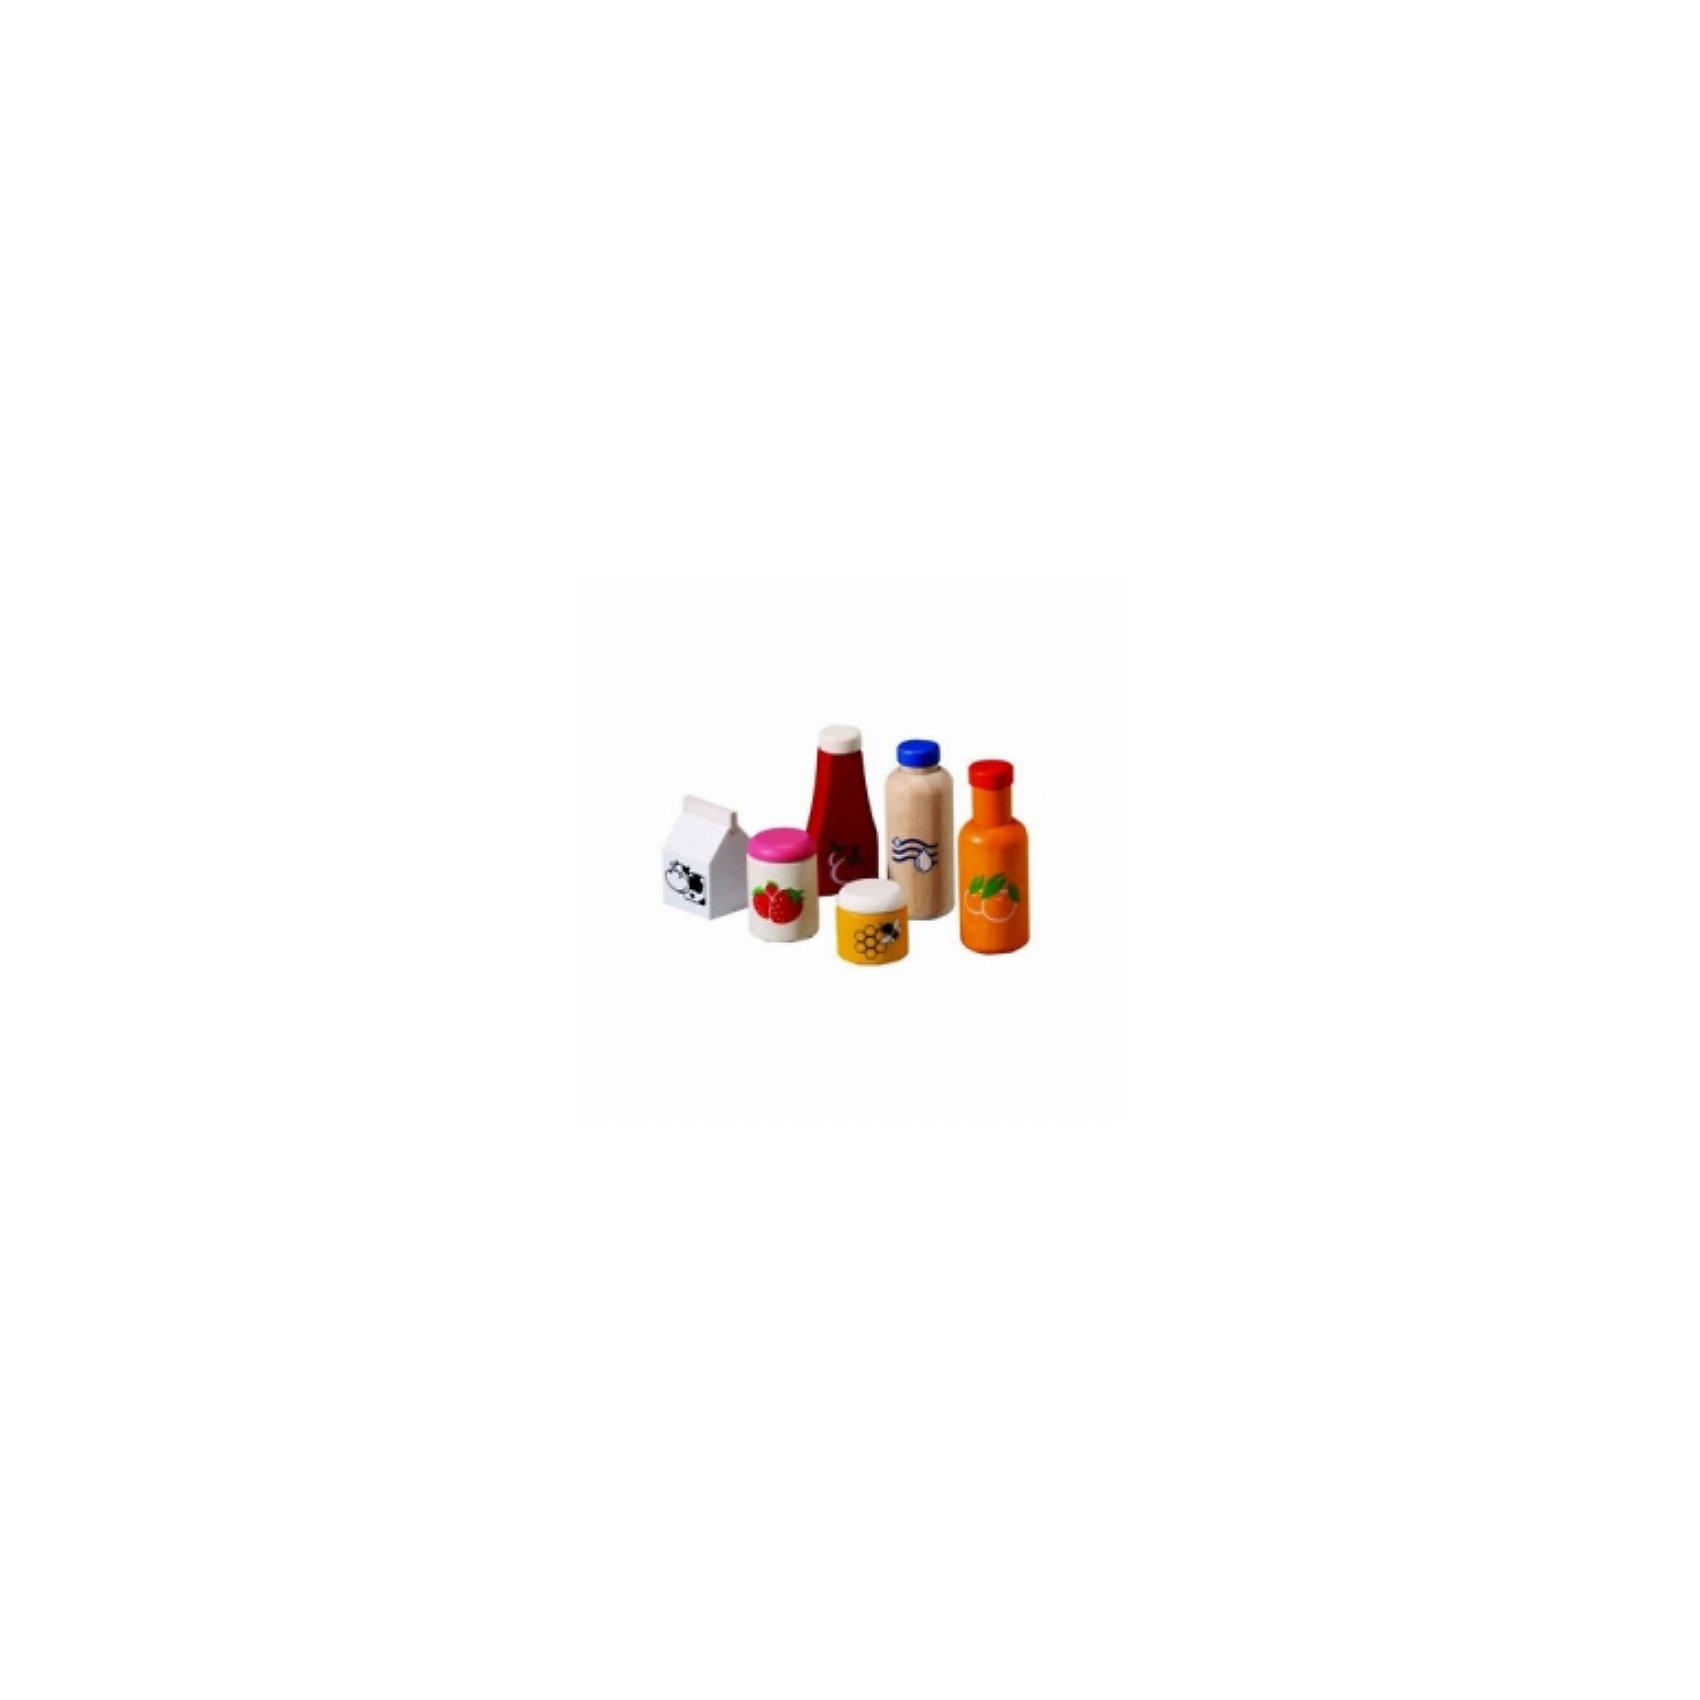 PLAN TOYS 3432 Набор еда и напитки